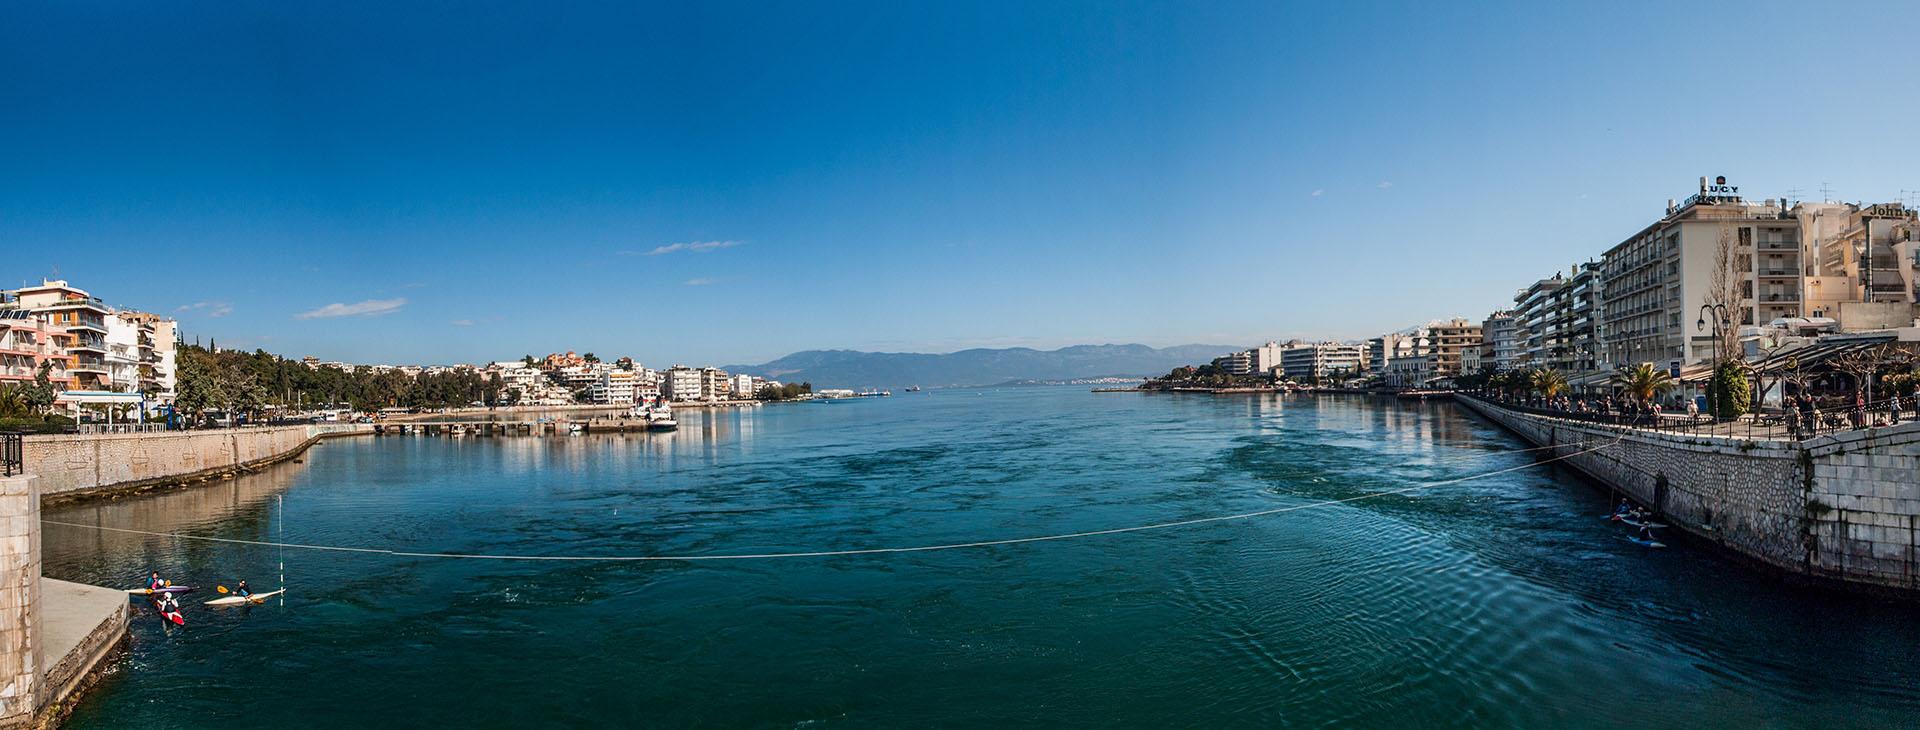 Euripus Strait / Chalcis, Evia